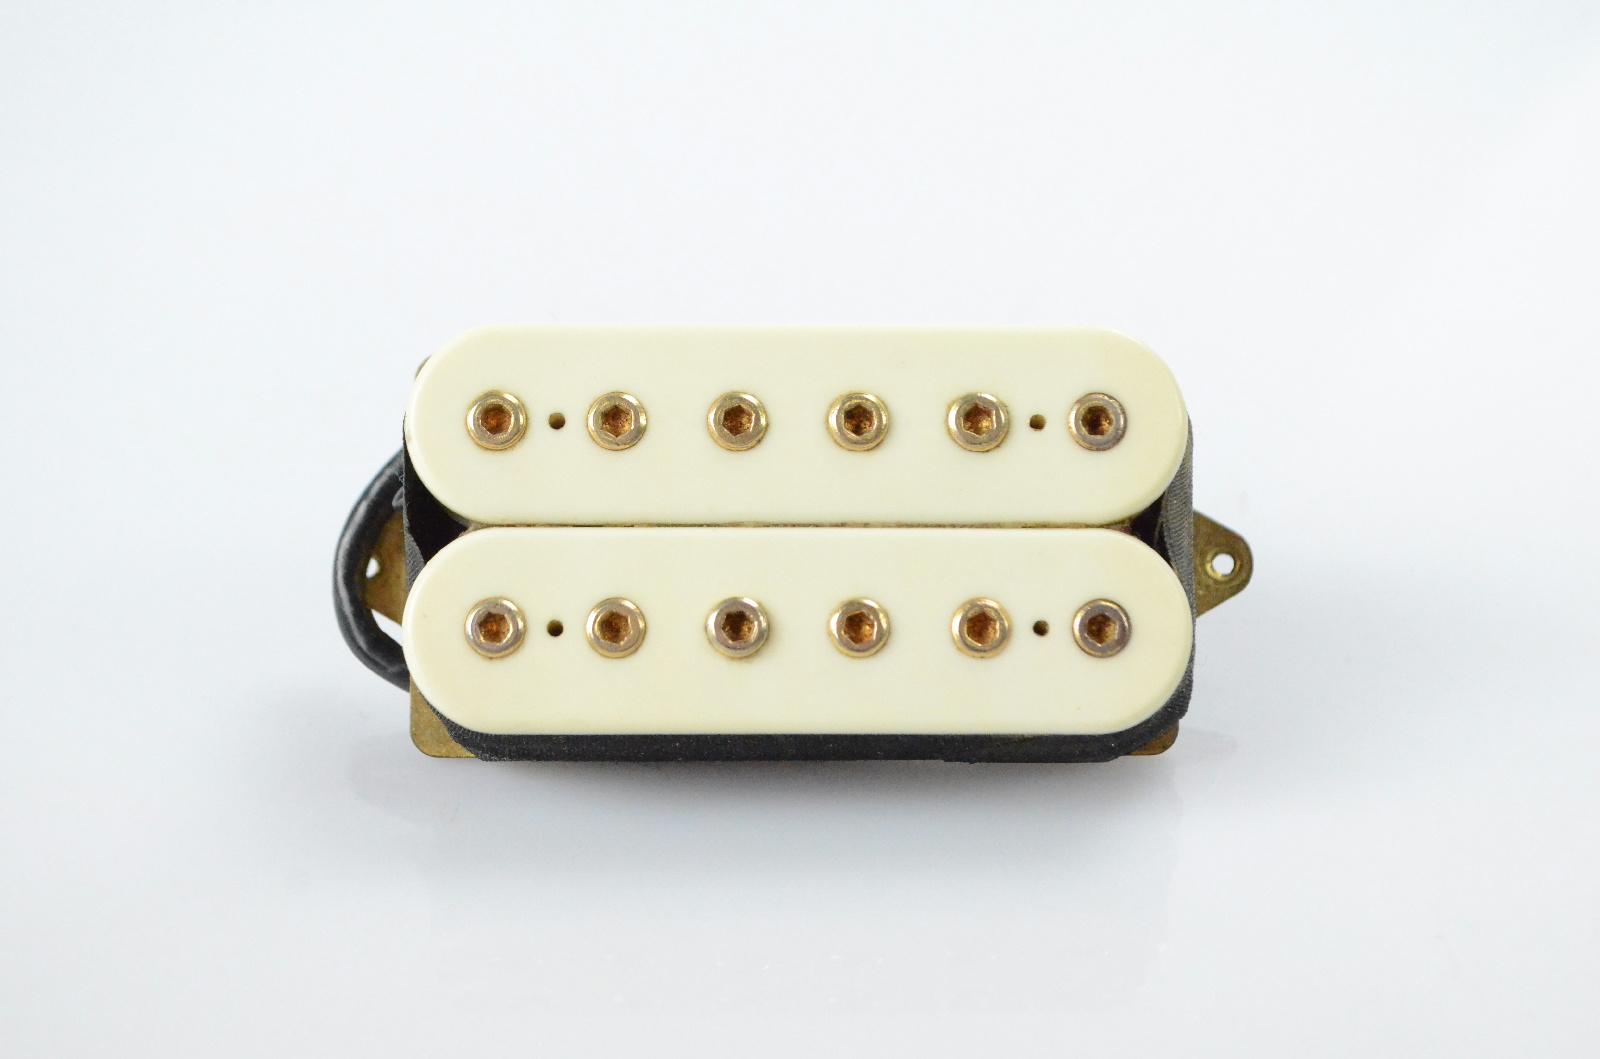 DiMarzio DP 151 Humbucker Guitar Pickup White #32723